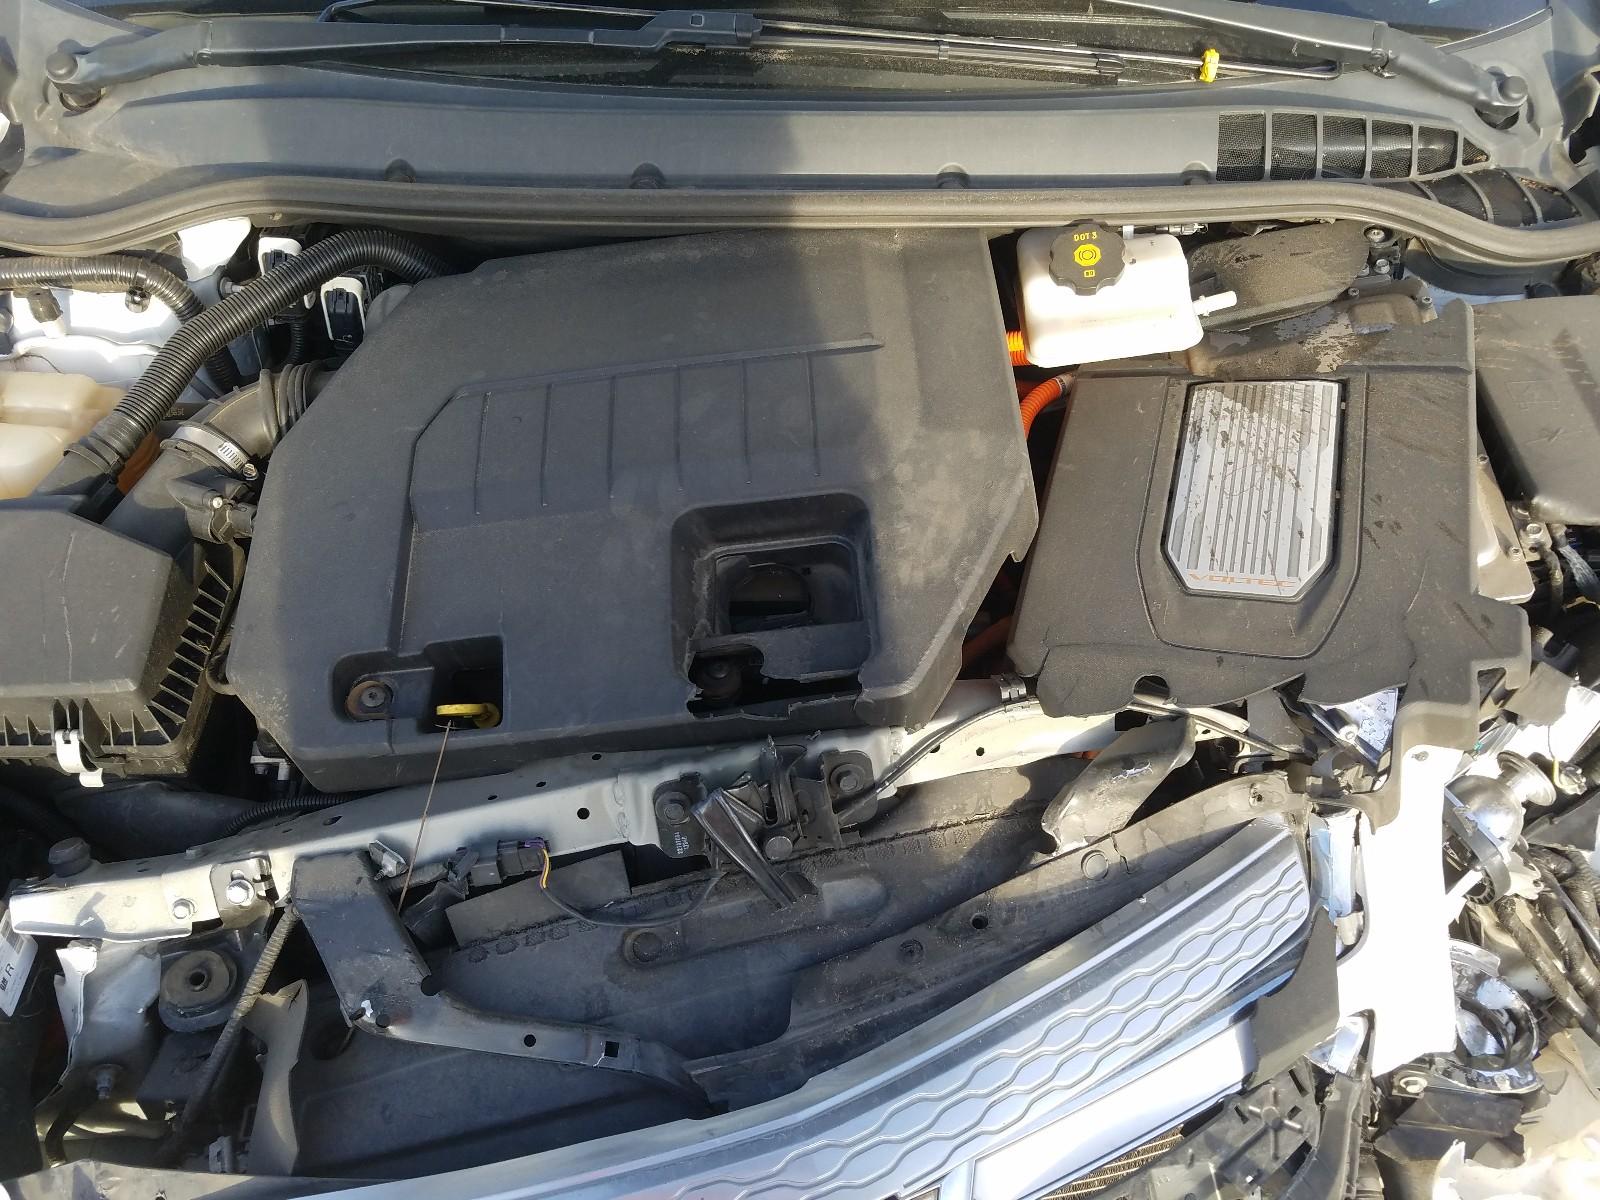 1G1RH6E47DU131223 - 2013 Chevrolet Volt 1.4L inside view